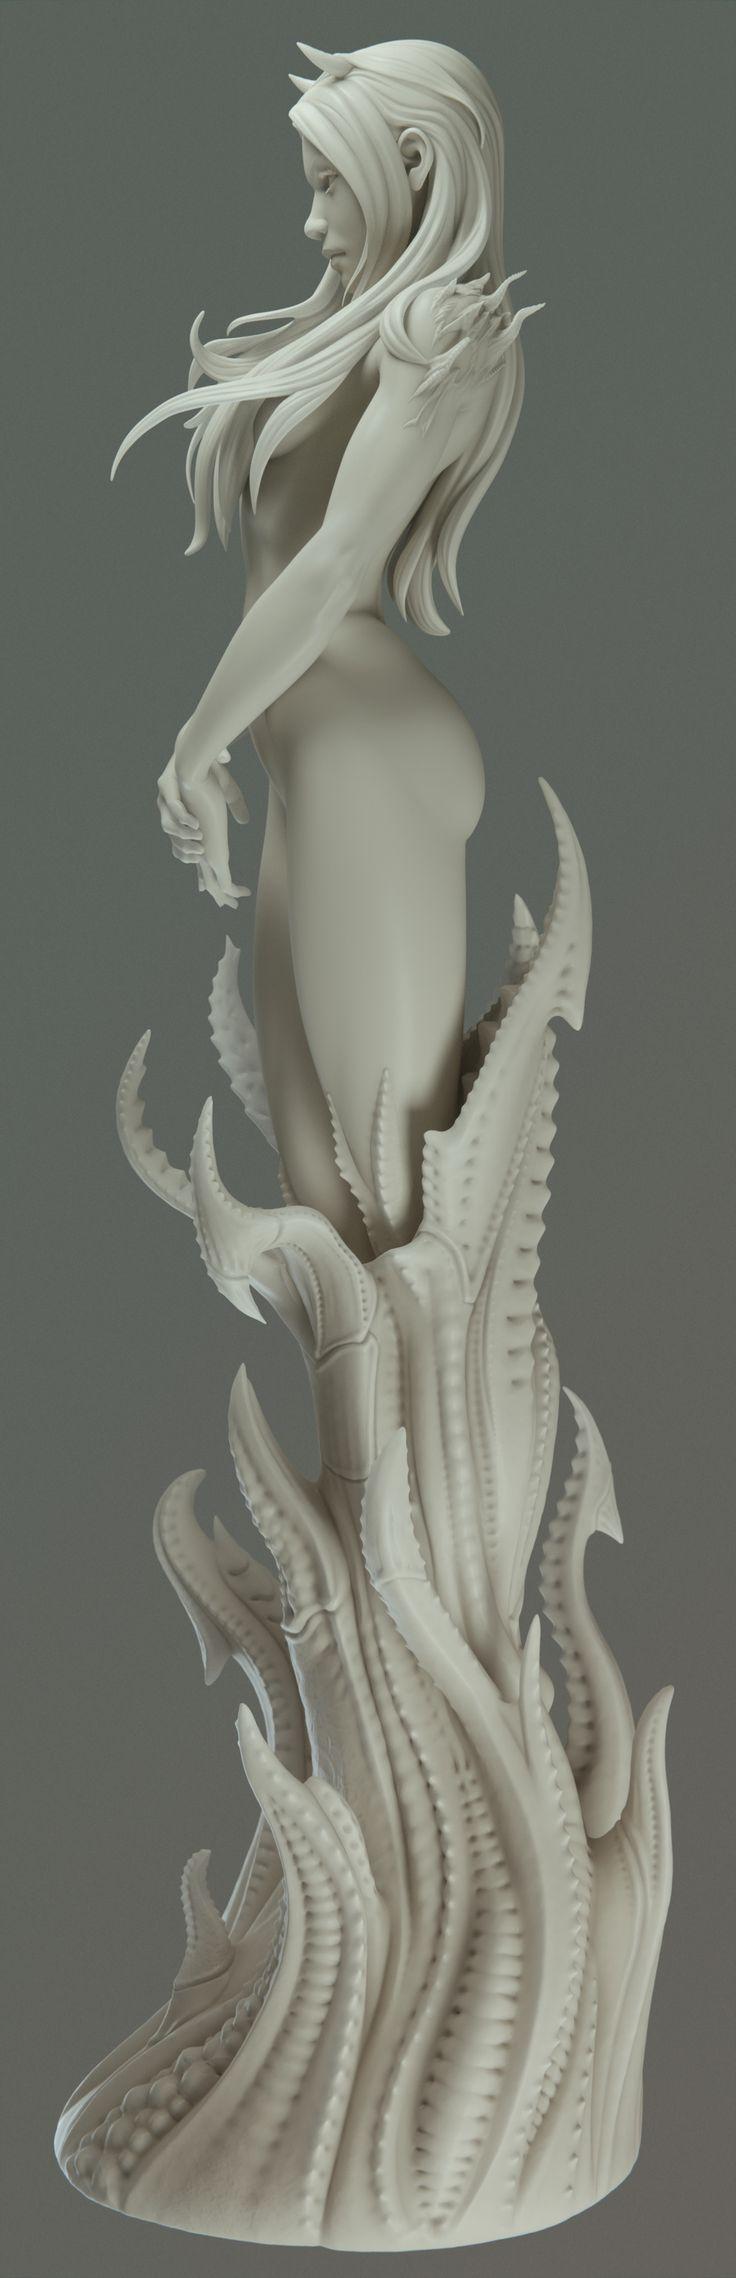 http://carstenstueben.cgsociety.org/art/zbrush-ring-figurative-3d-1356767